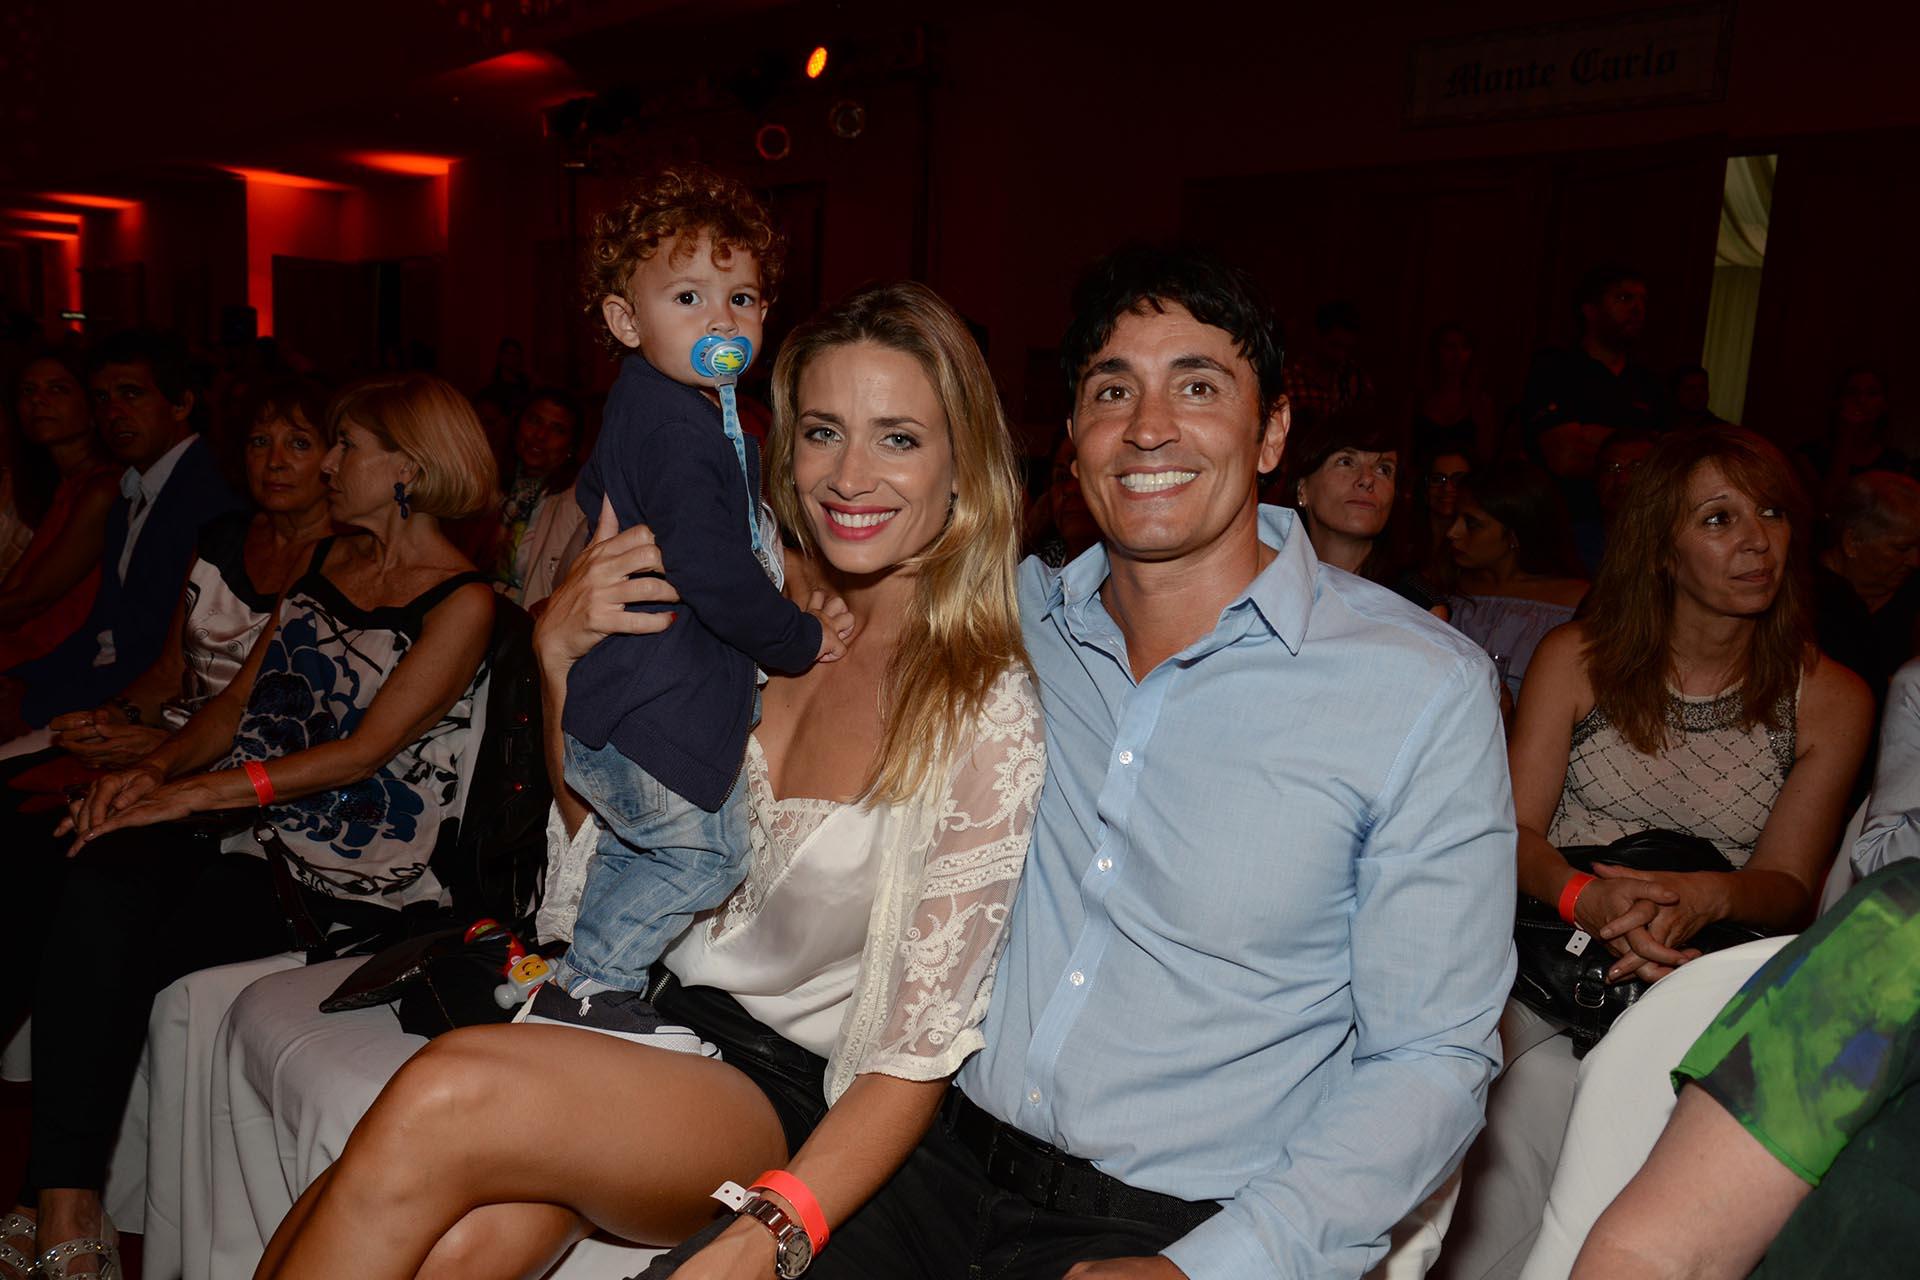 Sebastián Estevanez e Ivana Saccani con su pequeño hijo Valentino, en la primera fila del desfile